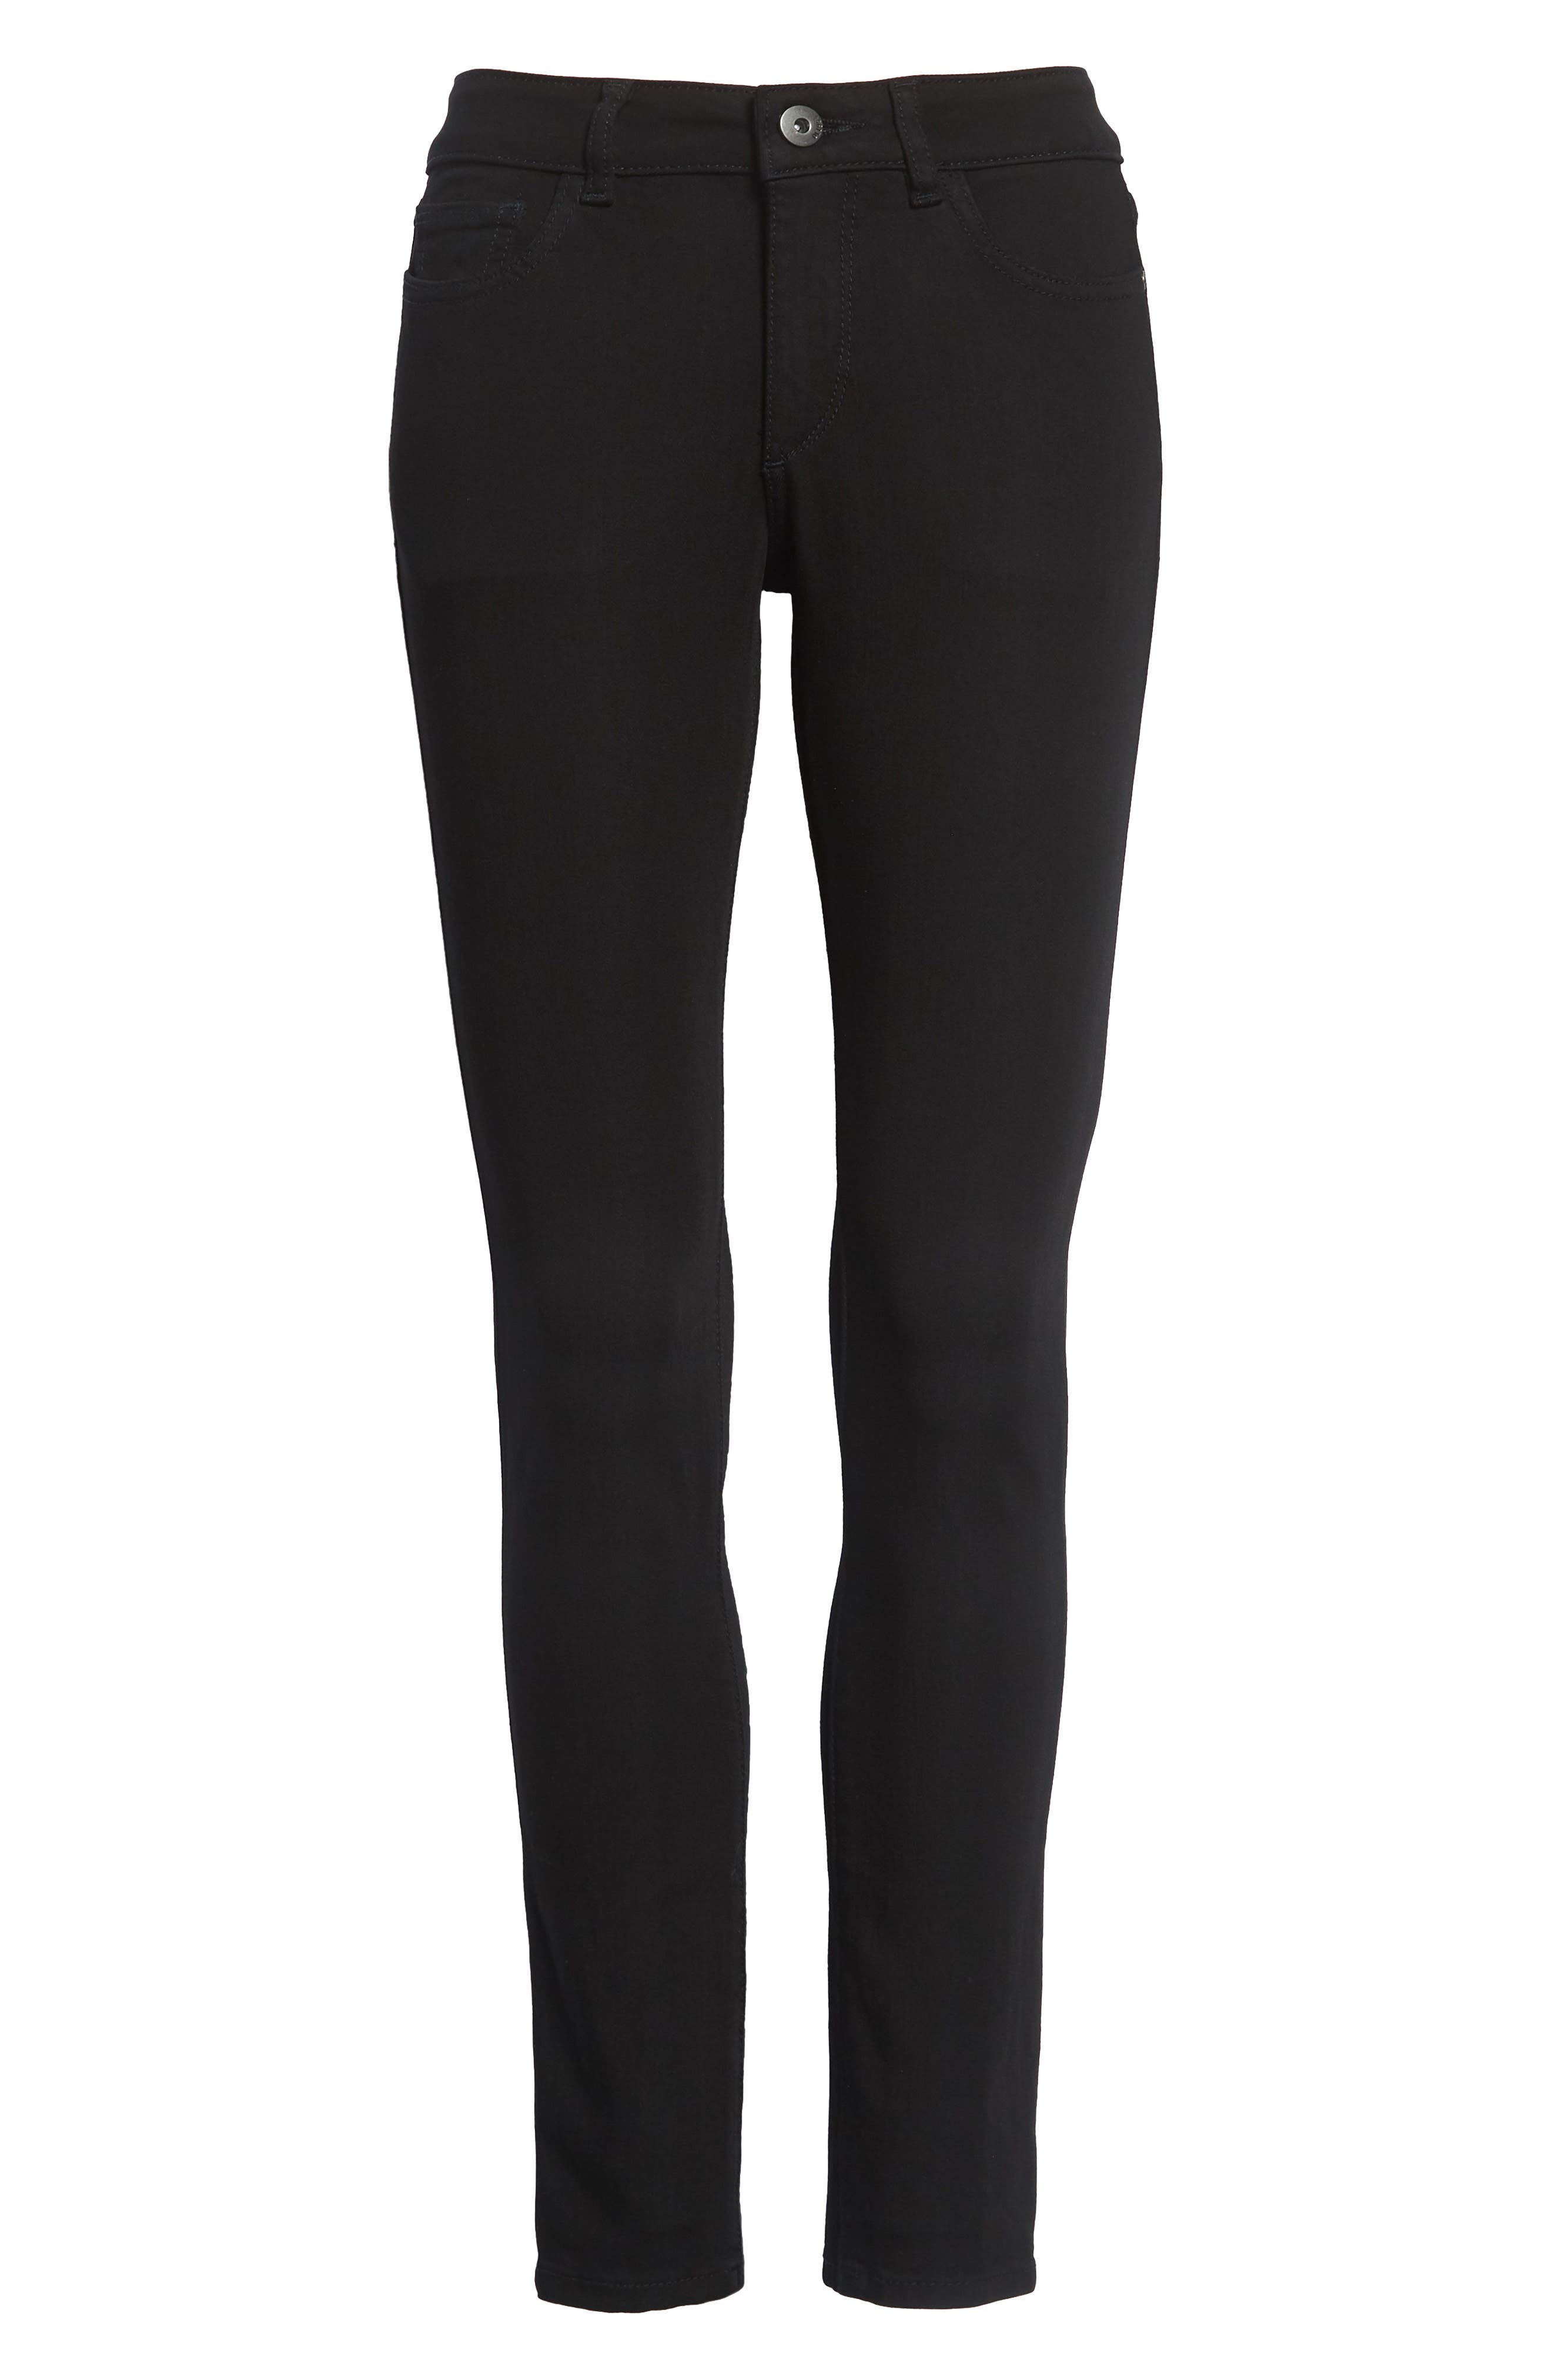 'Emma' Power Legging Jeans,                             Alternate thumbnail 2, color,